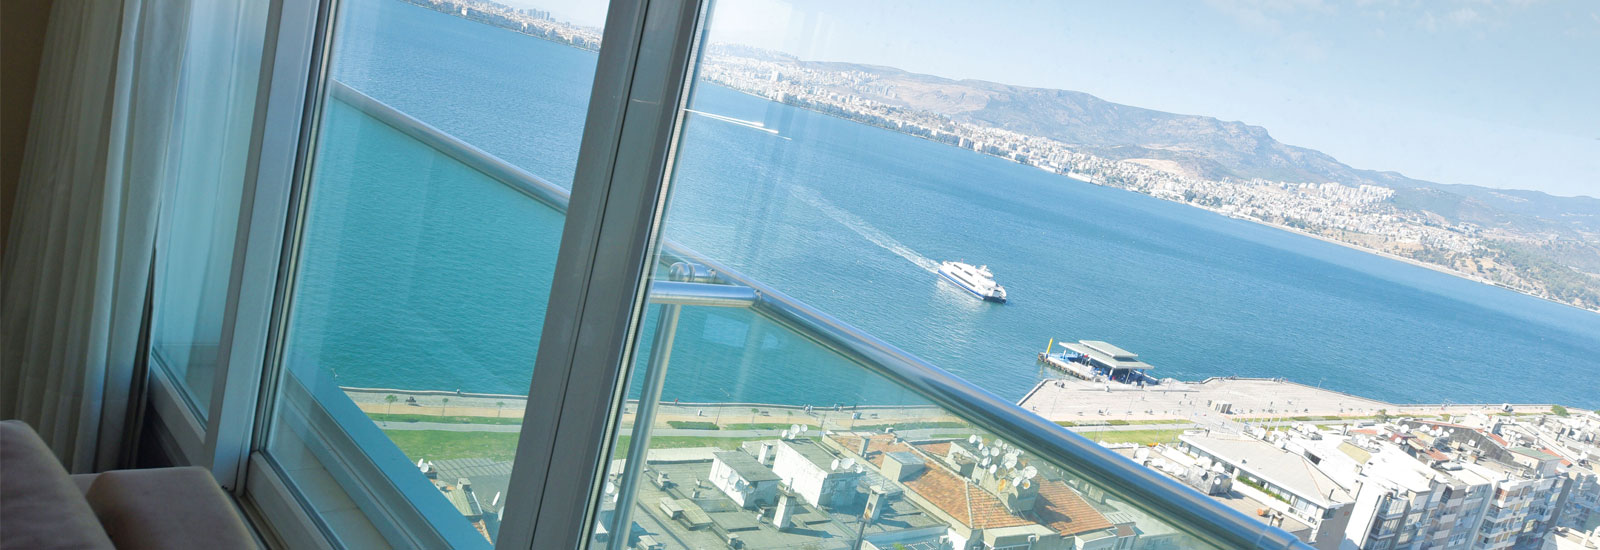 Ege Palas Business Hotel Izmir